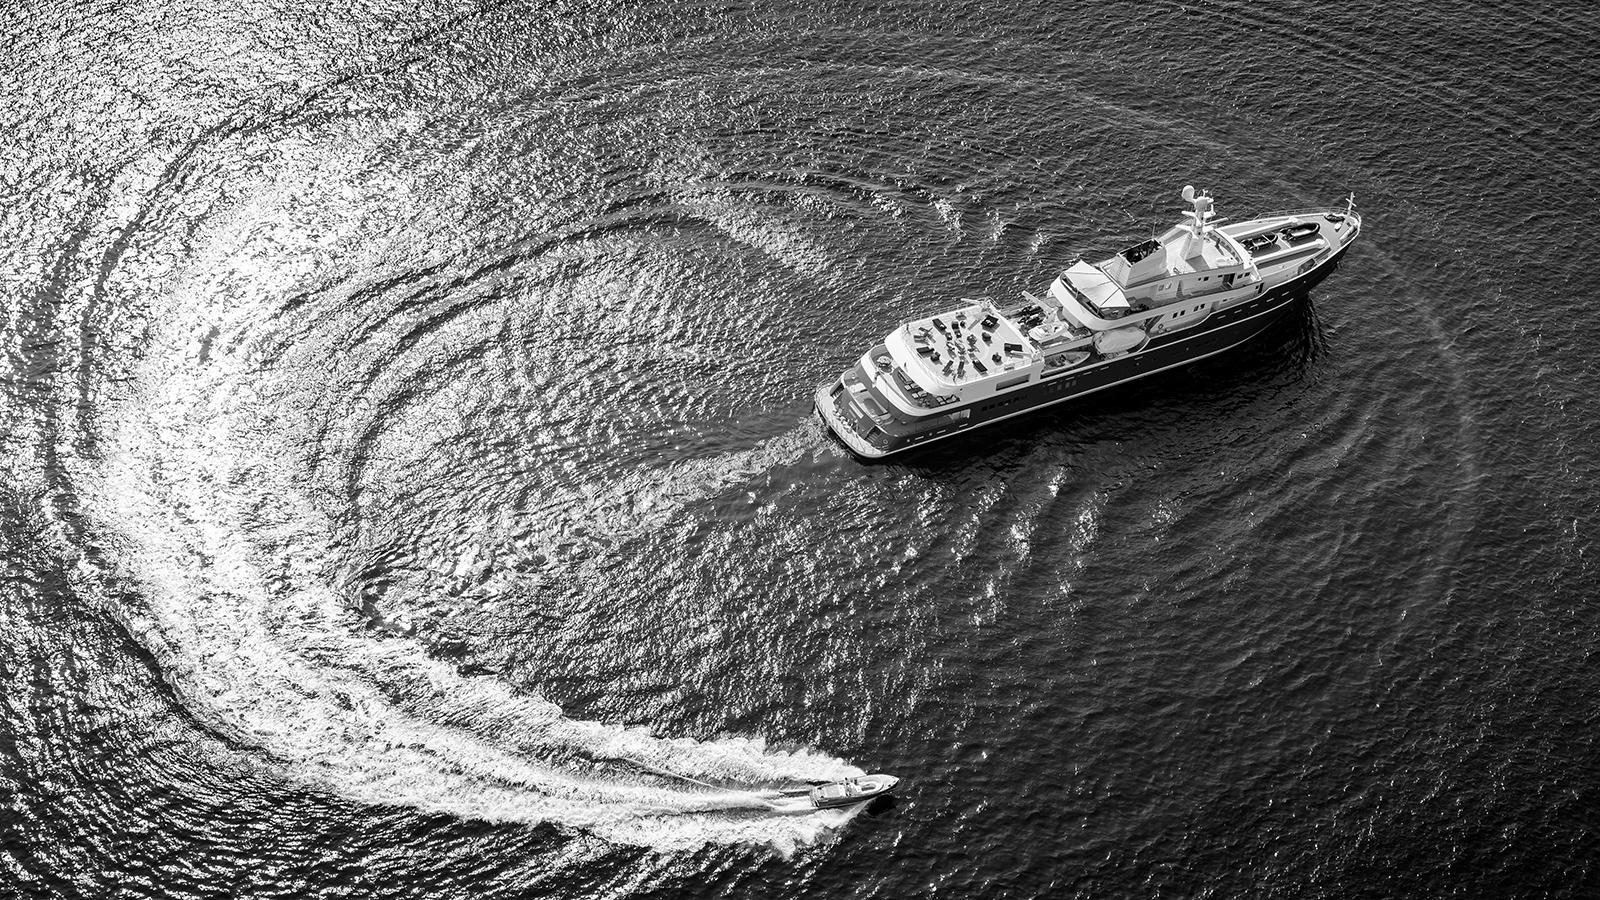 aerial-view-of-ihc-explorer-yacht-legend